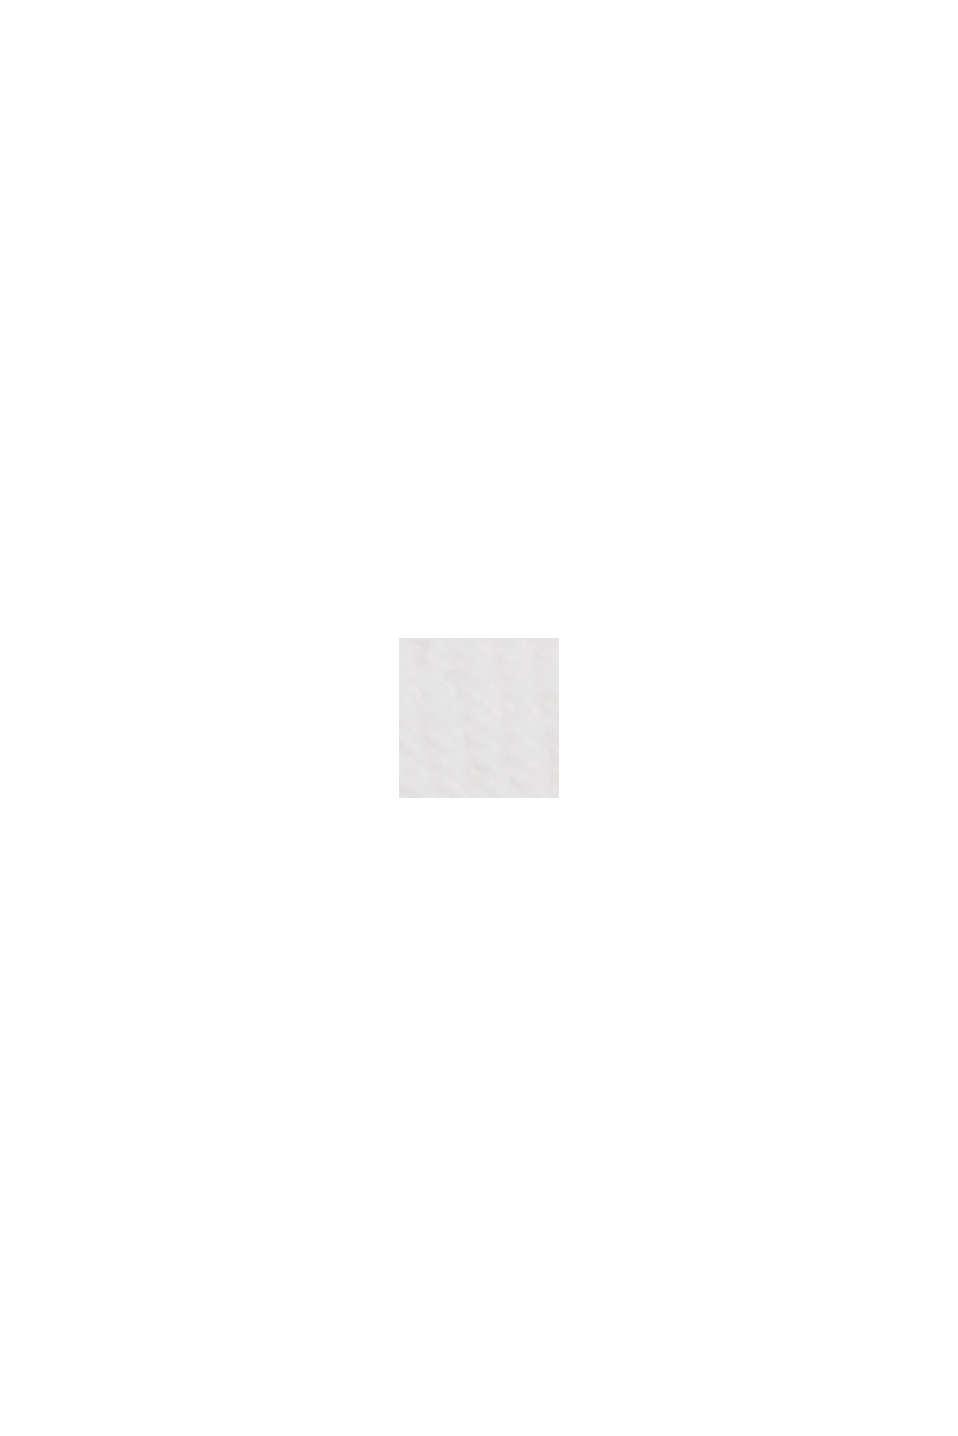 Vaqueros elásticos de algodón ecológico, WHITE, swatch